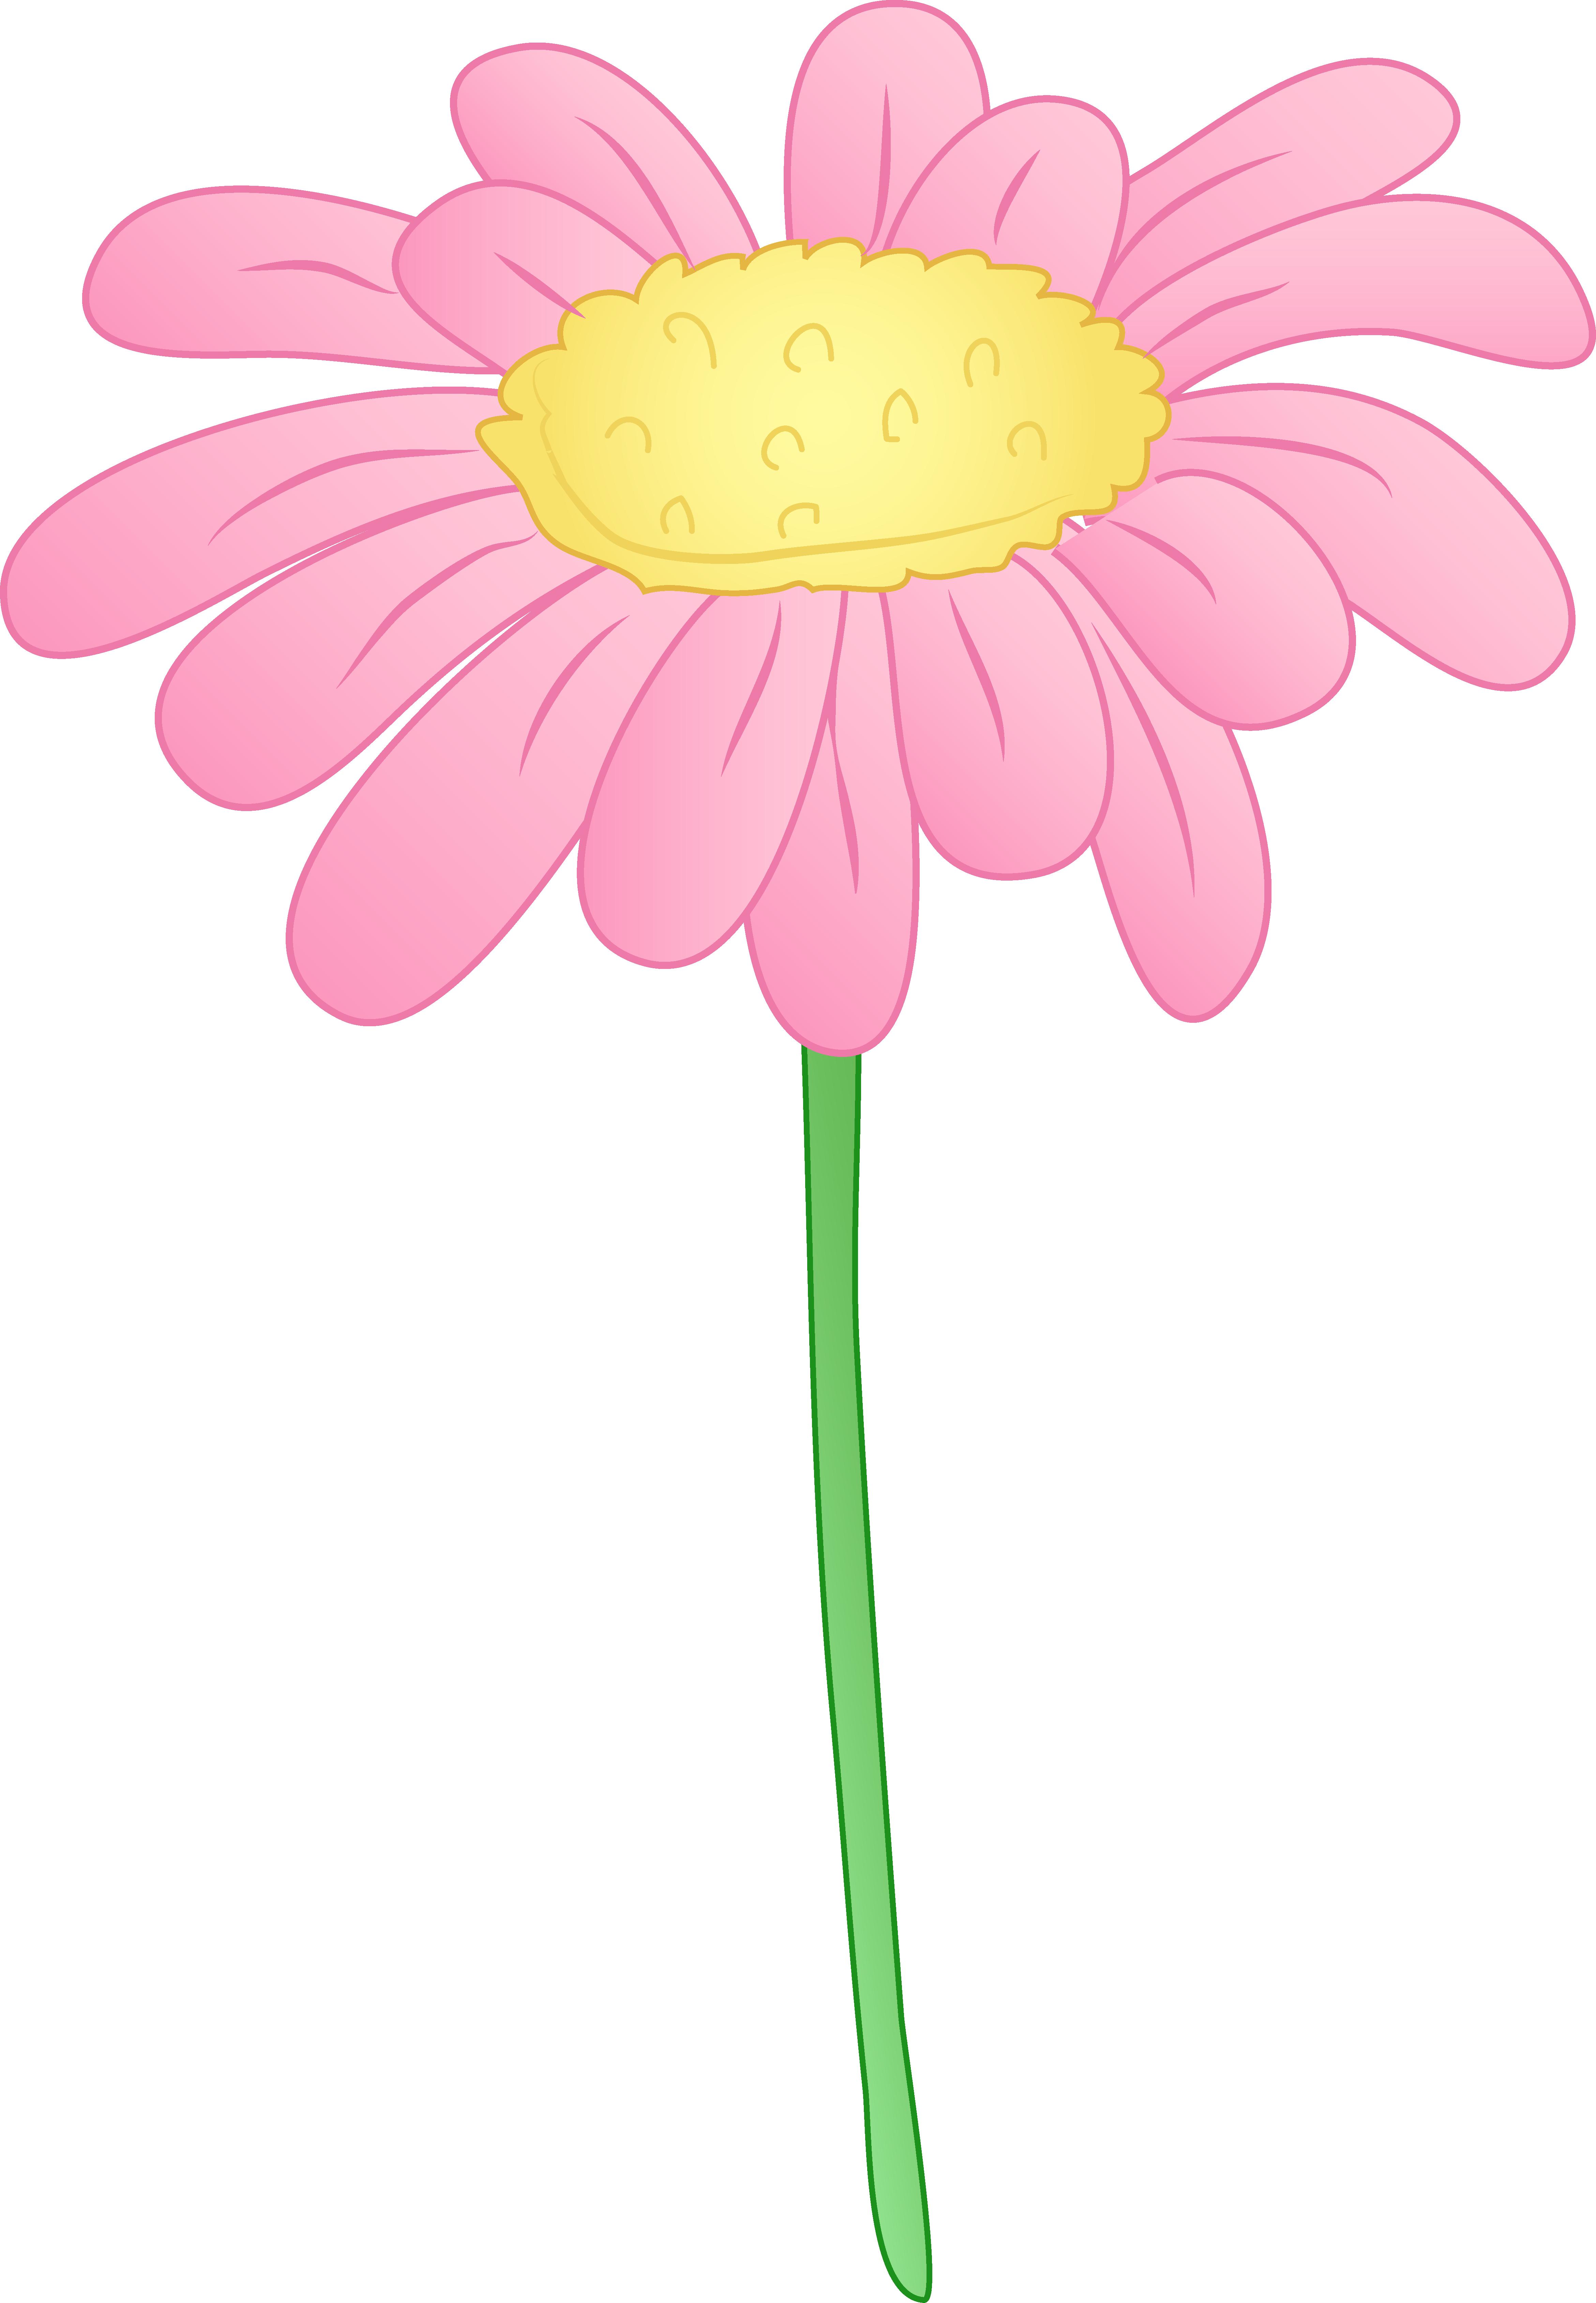 Pretty pink daisy flower free clip art clipartandscrap.